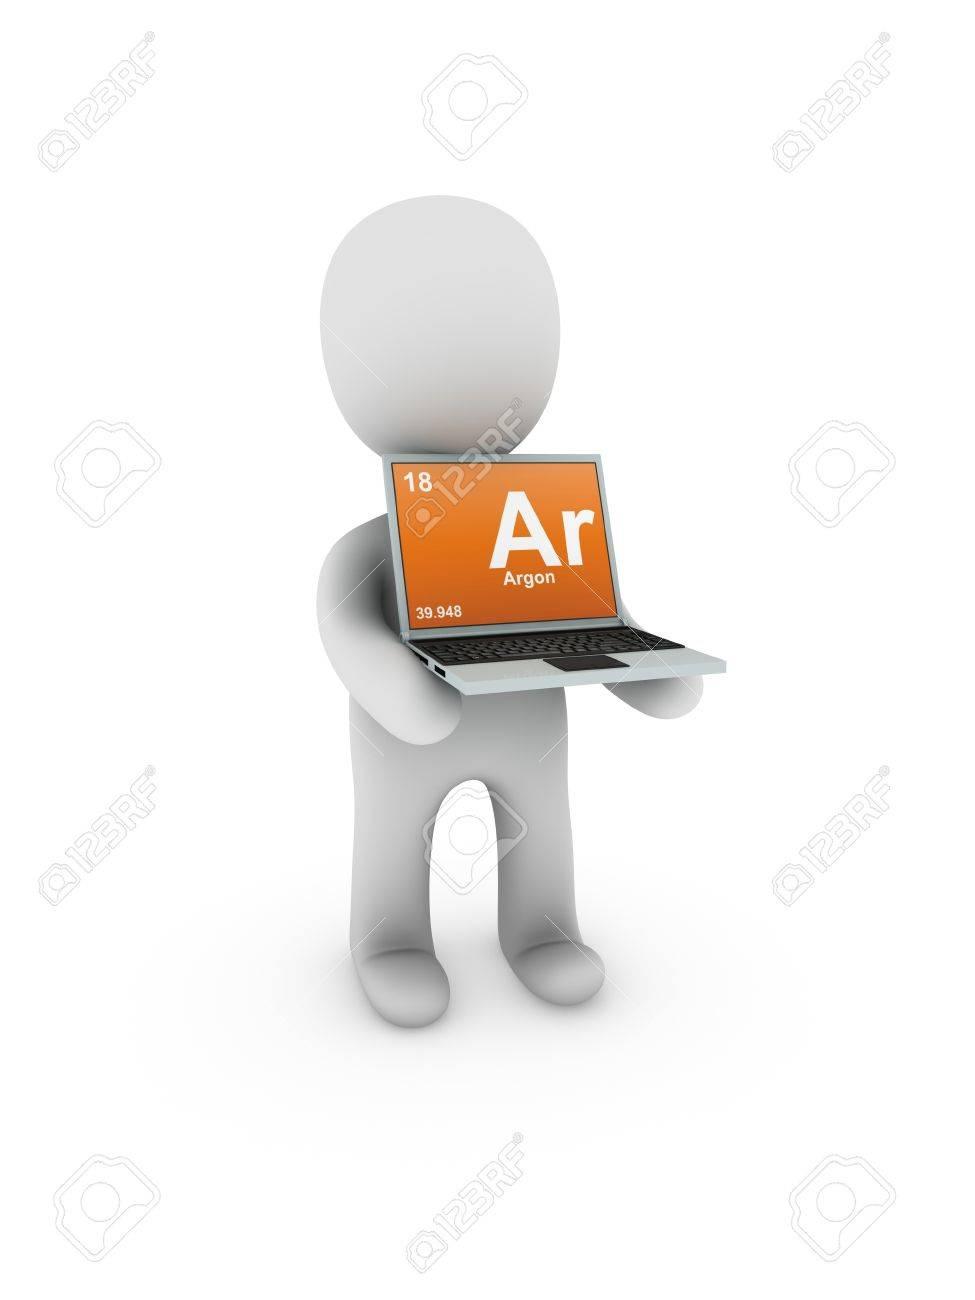 argon symbol on screen laptop Stock Photo - 13539314